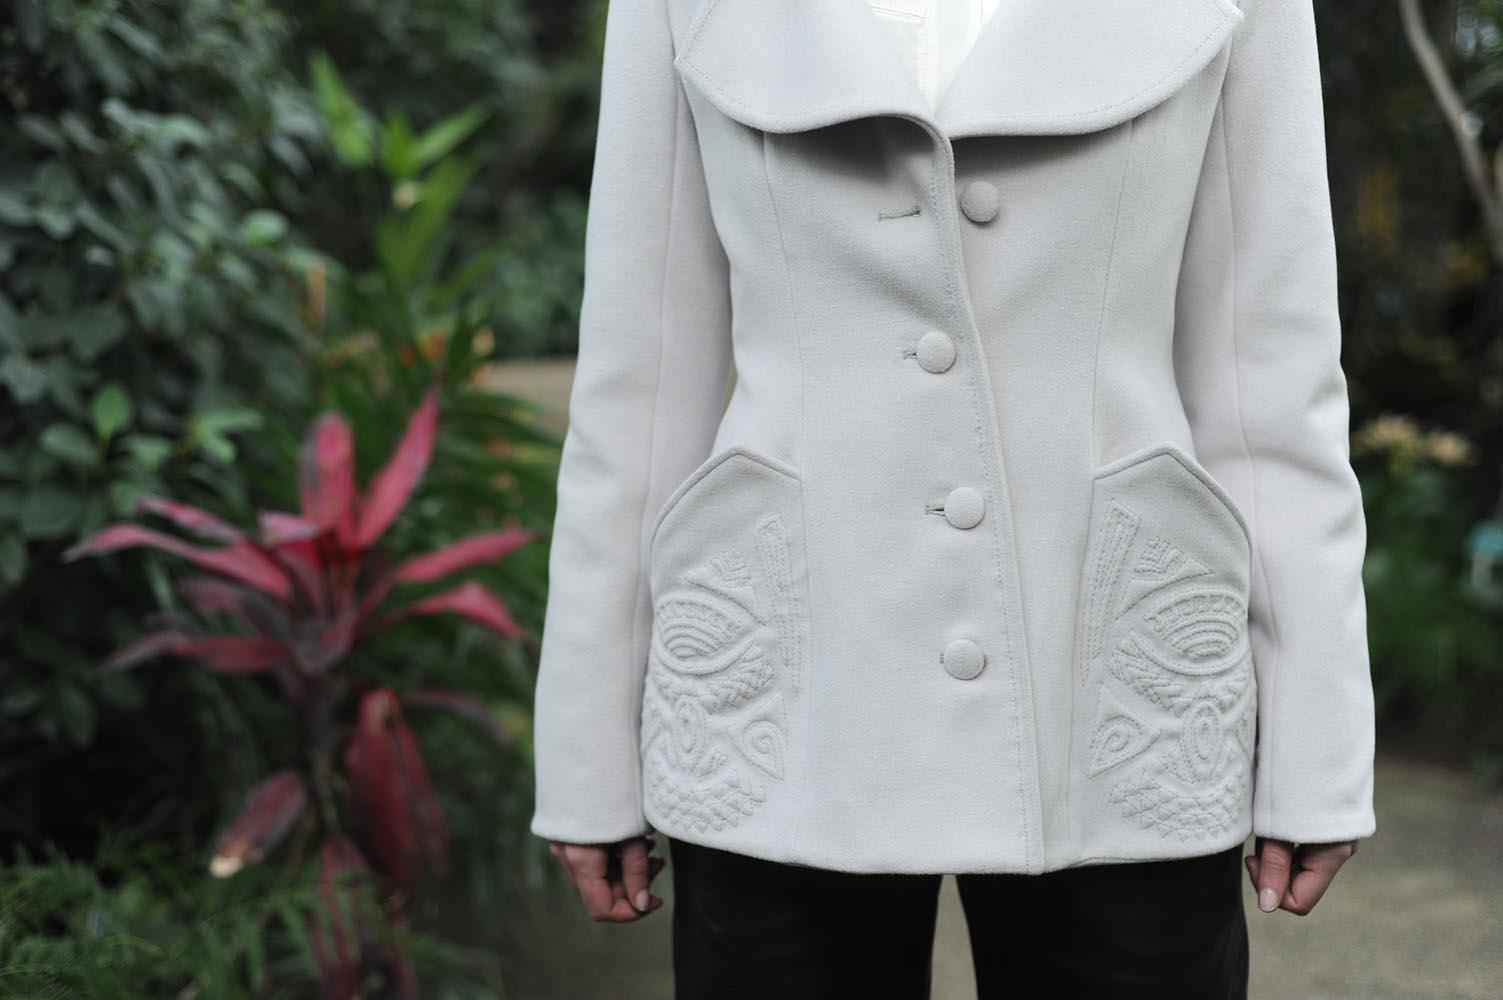 hips-length-angora-cashmere-coat-embroidered-front-details.JPG